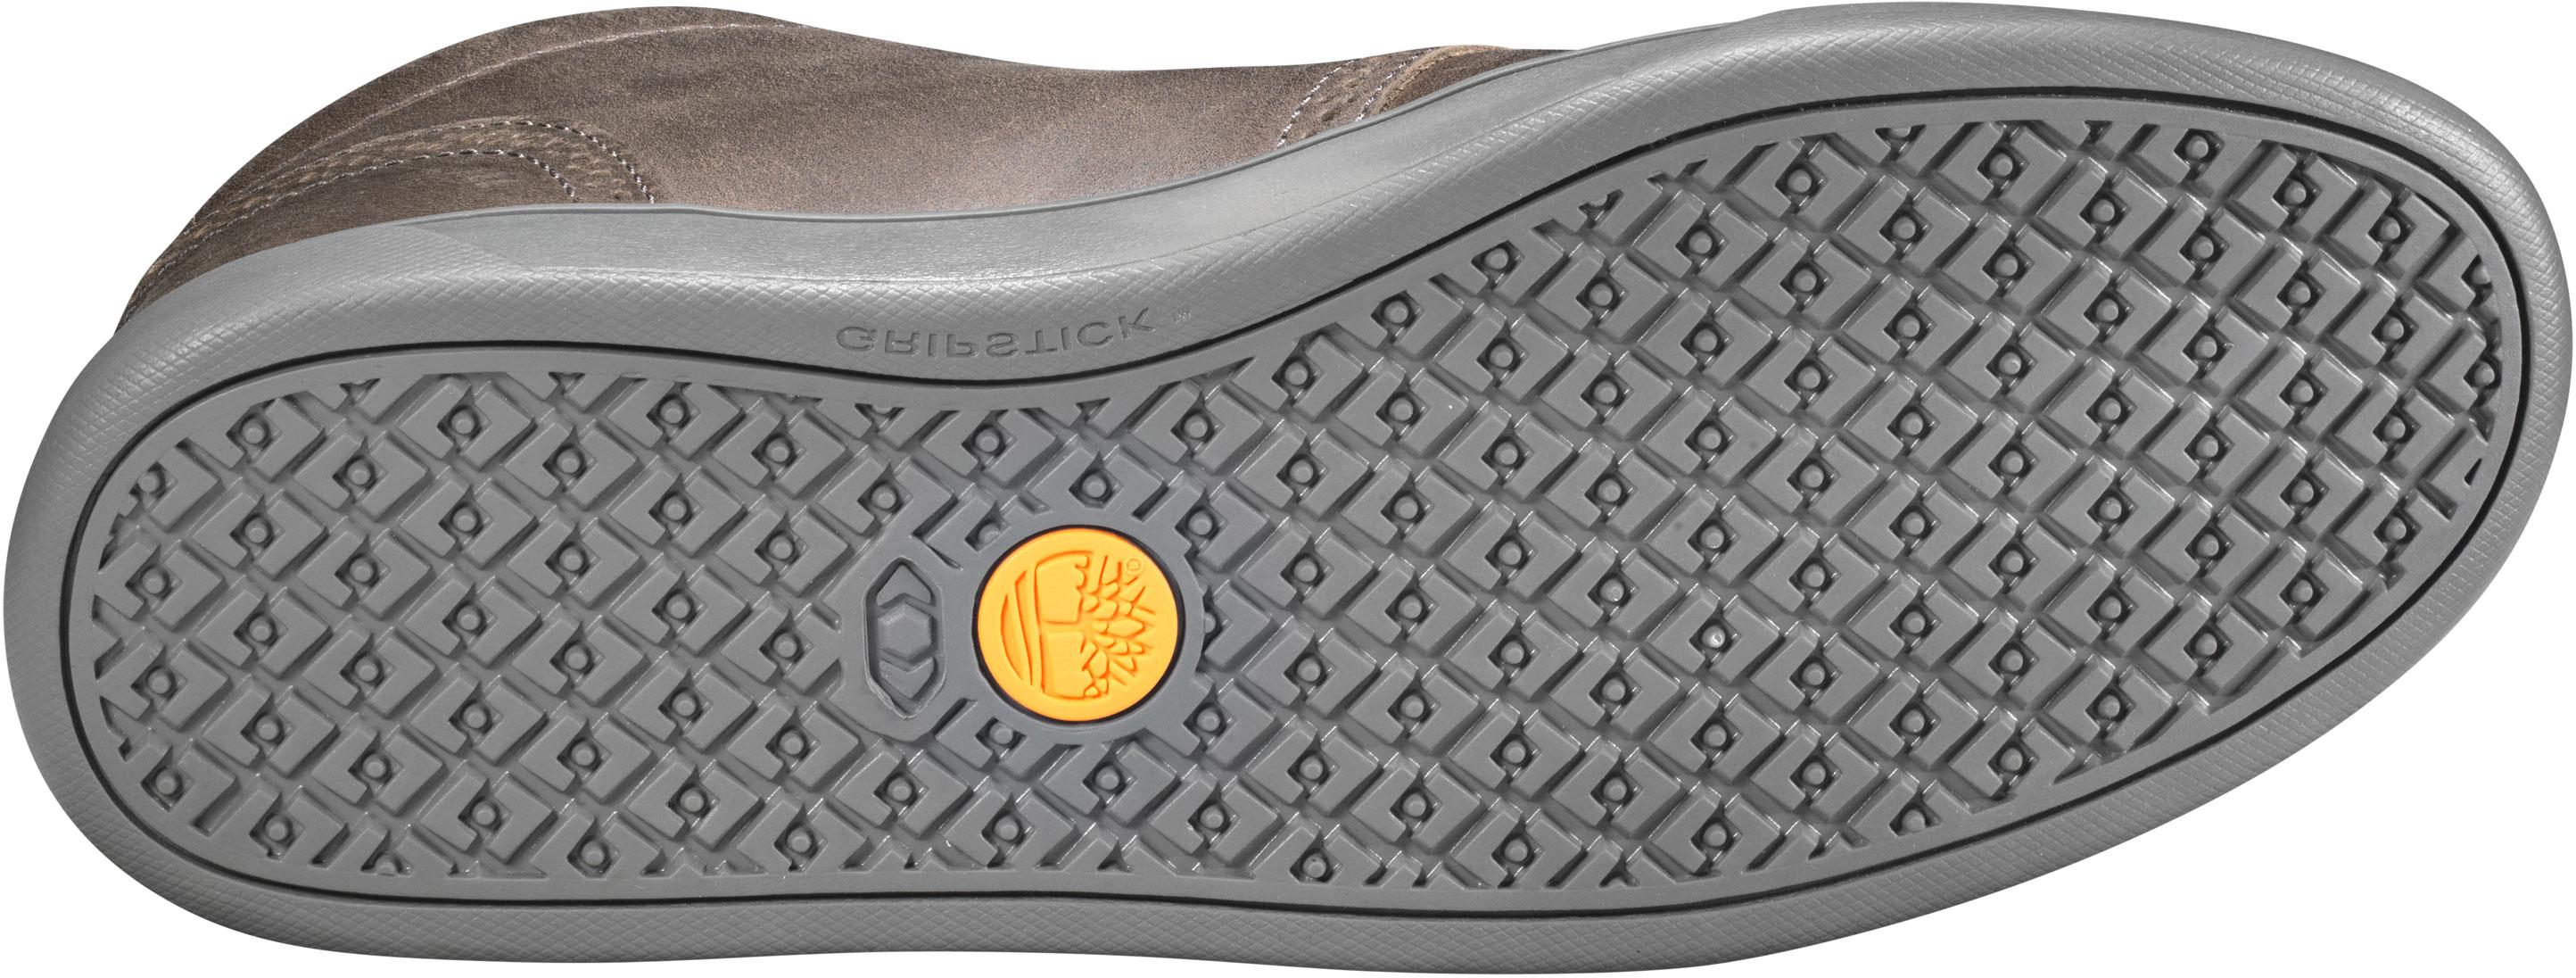 1368531f ... Timberland Men's Groveton Lux Leather Chukka TB0A1ZJC039 Dark Grey Full  Grain Leather ...